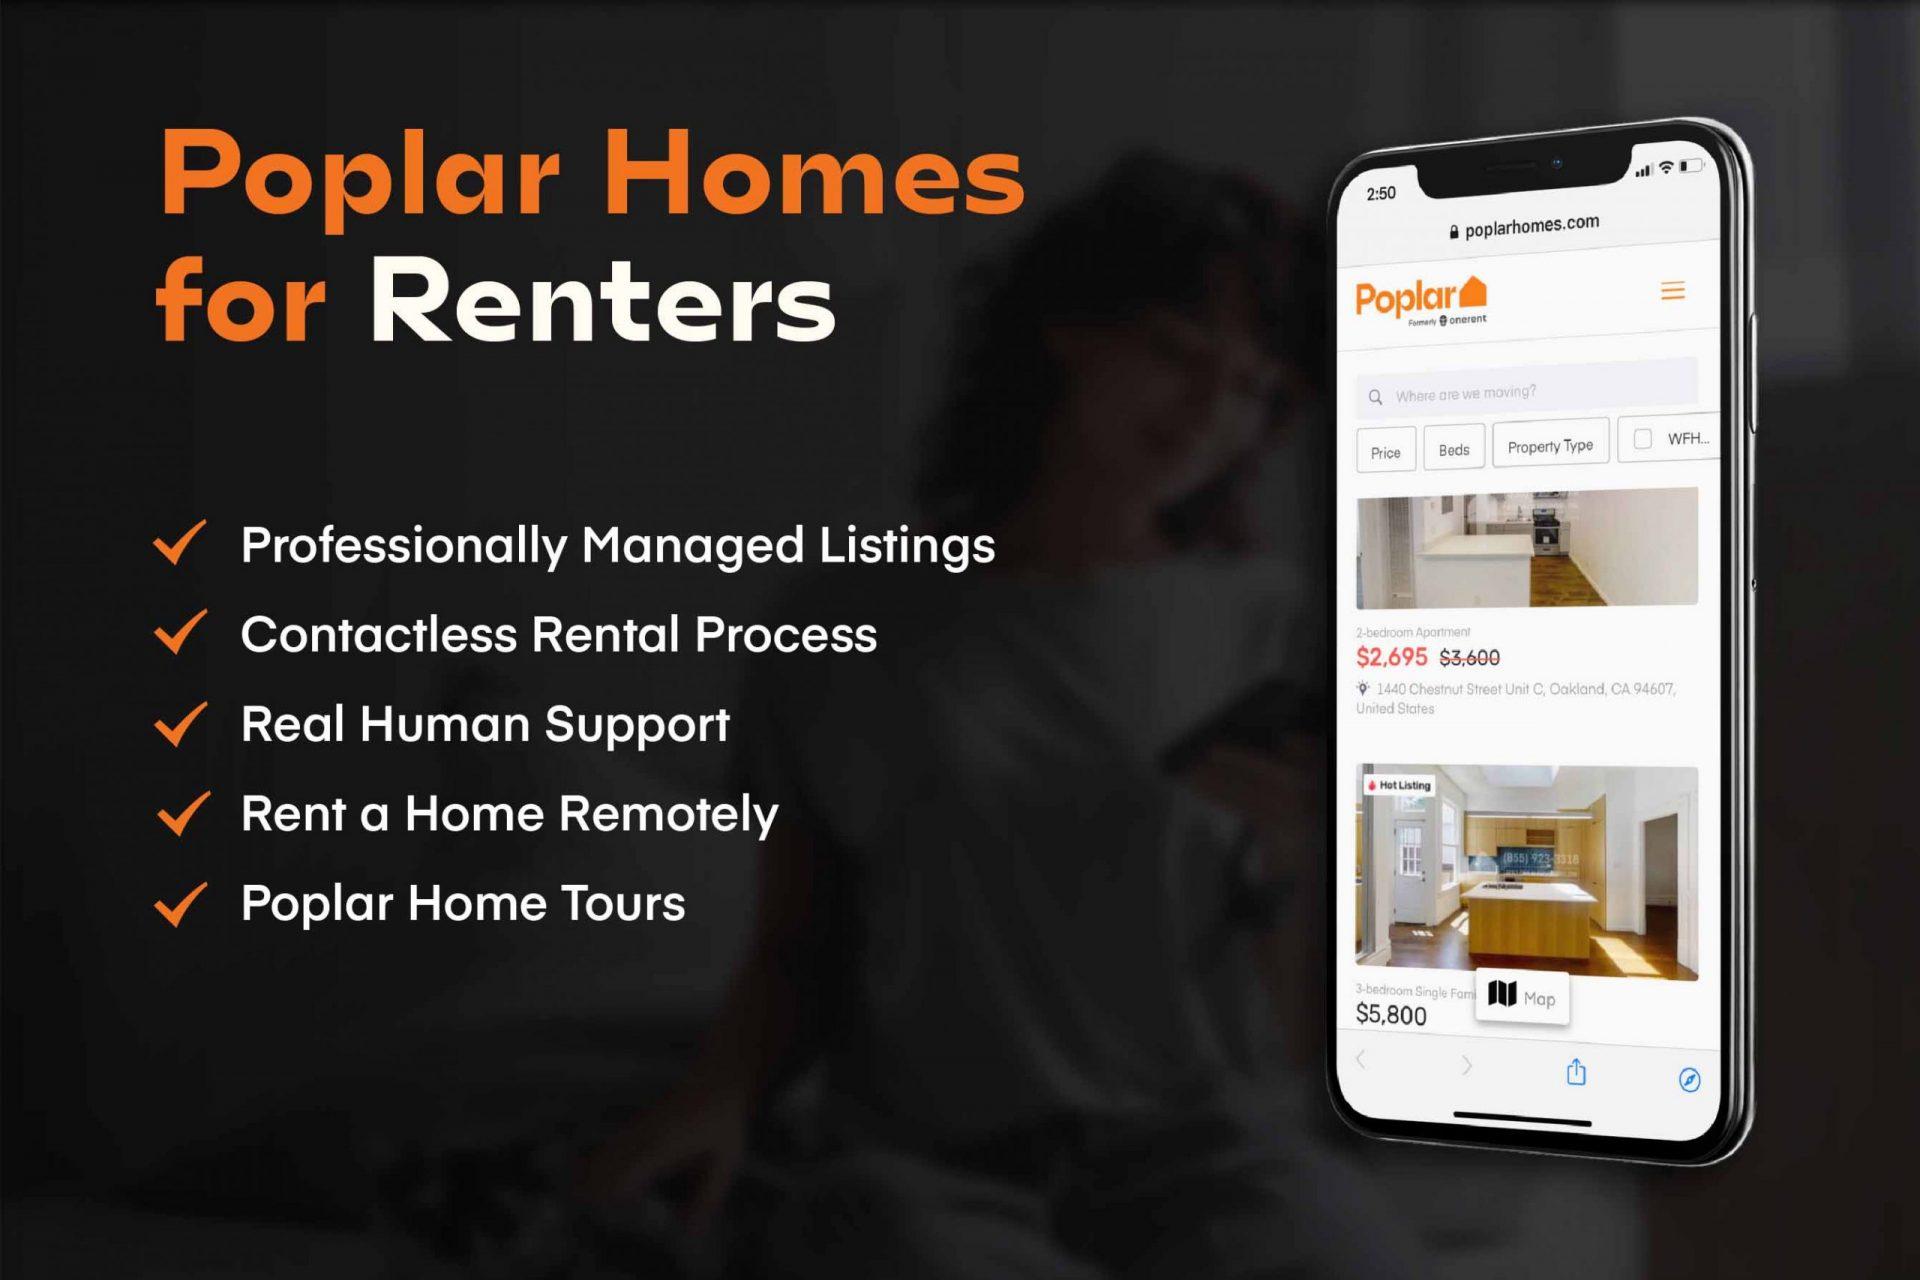 poplar homes for renters